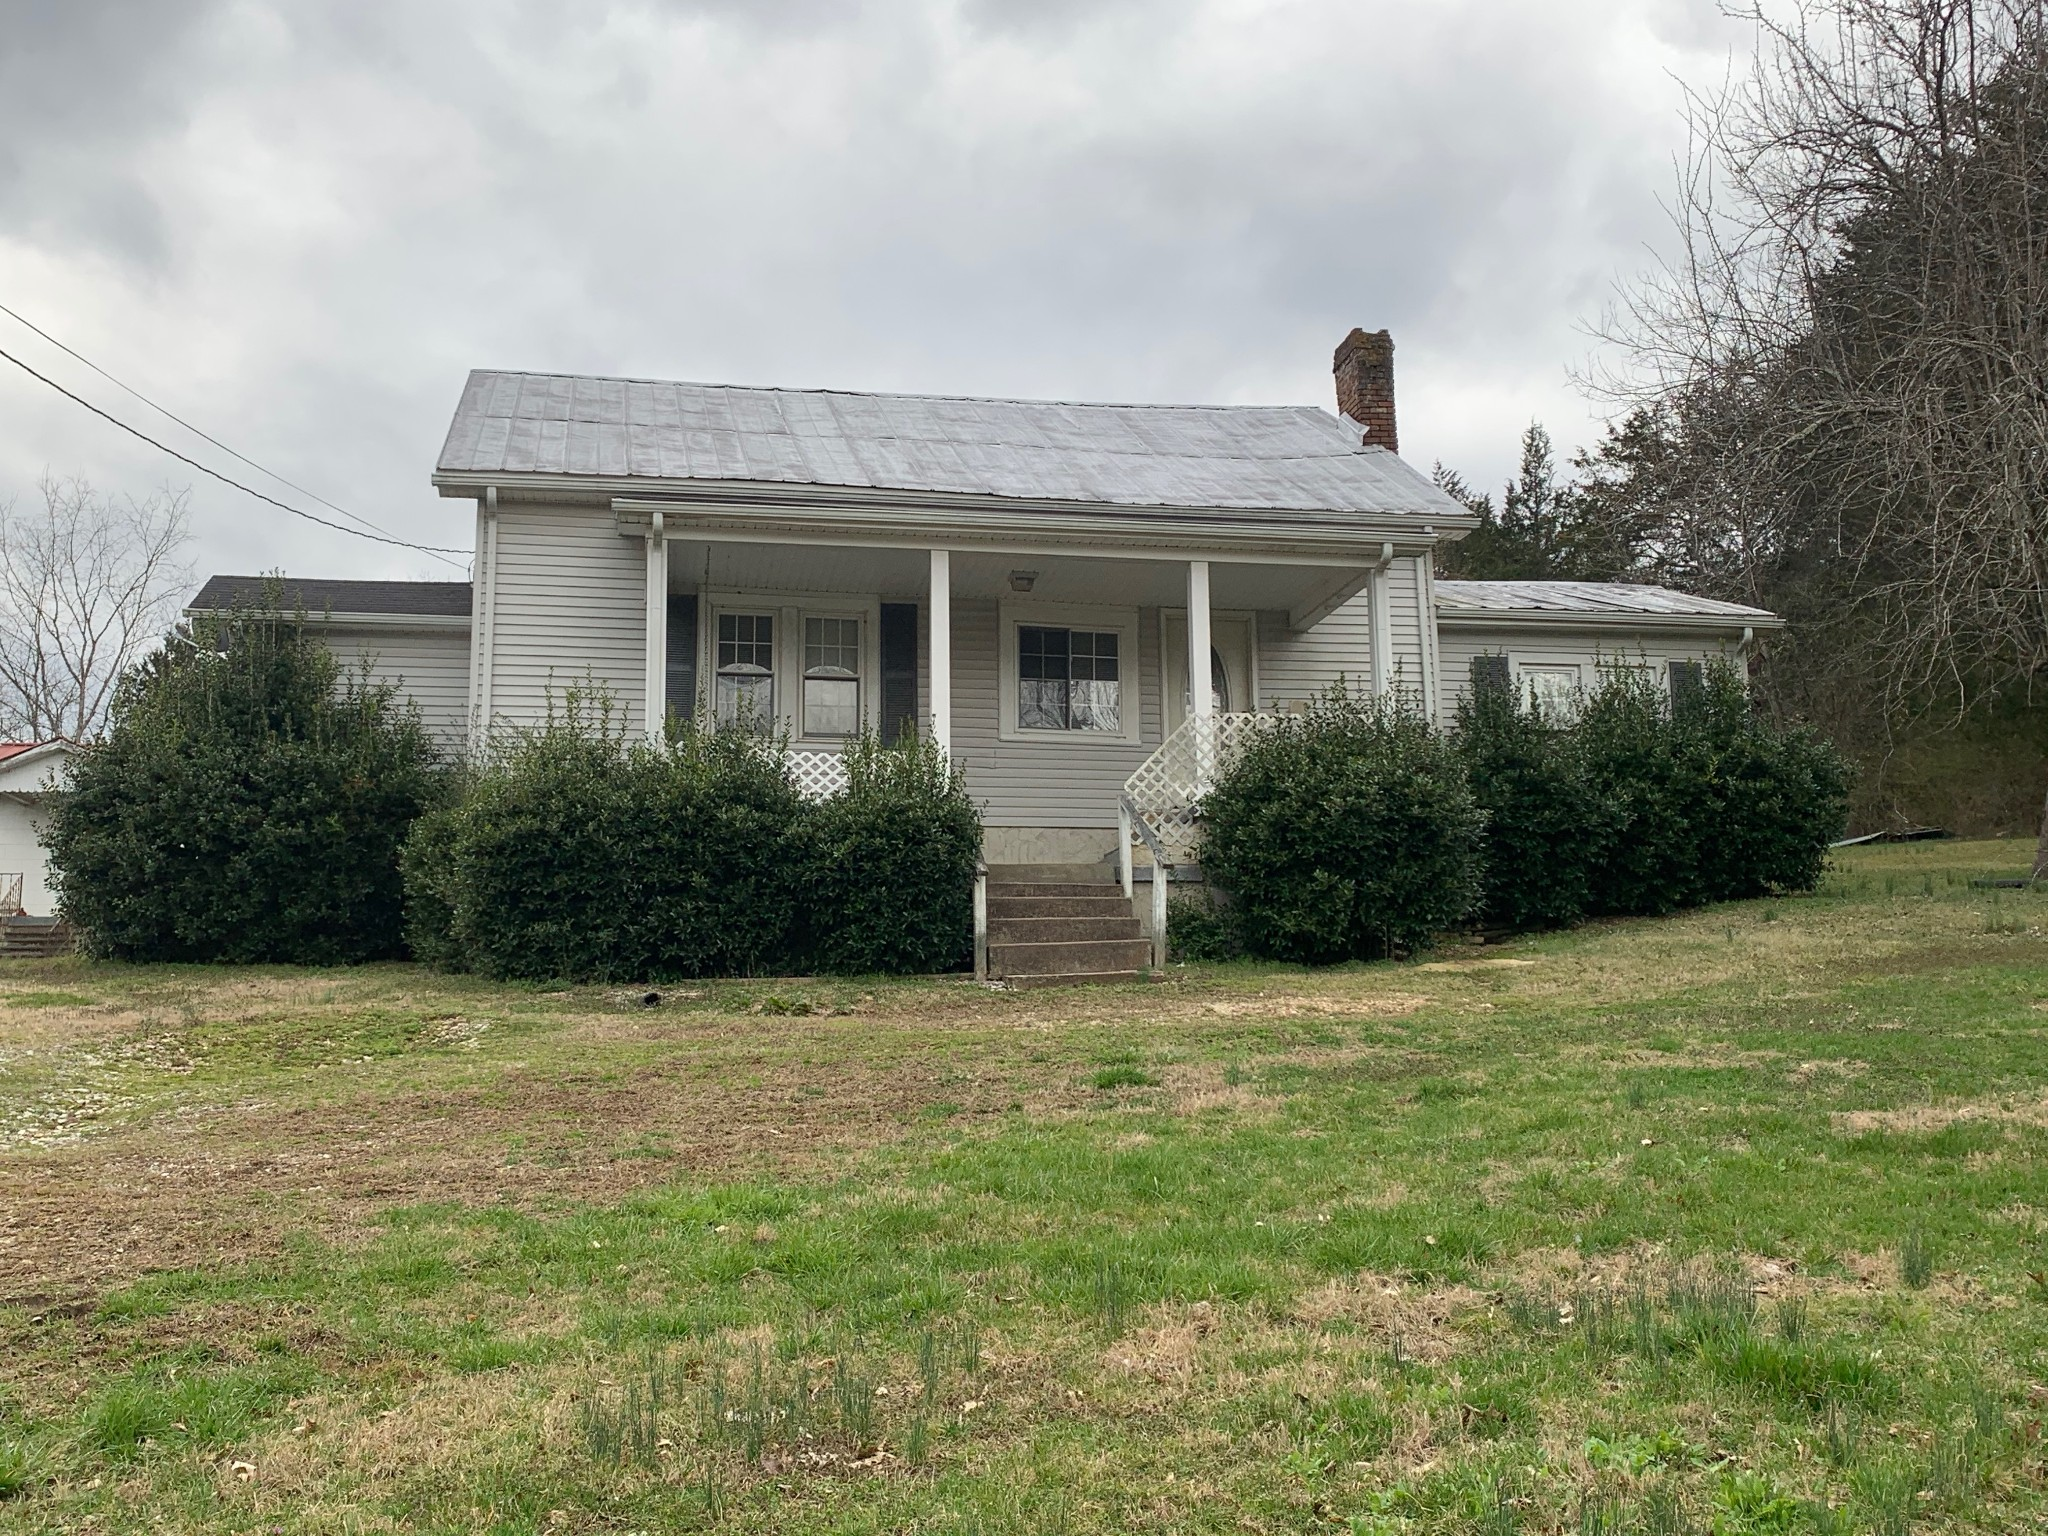 41 Little Creek Rd, Pleasant Shade, TN 37145 - Pleasant Shade, TN real estate listing